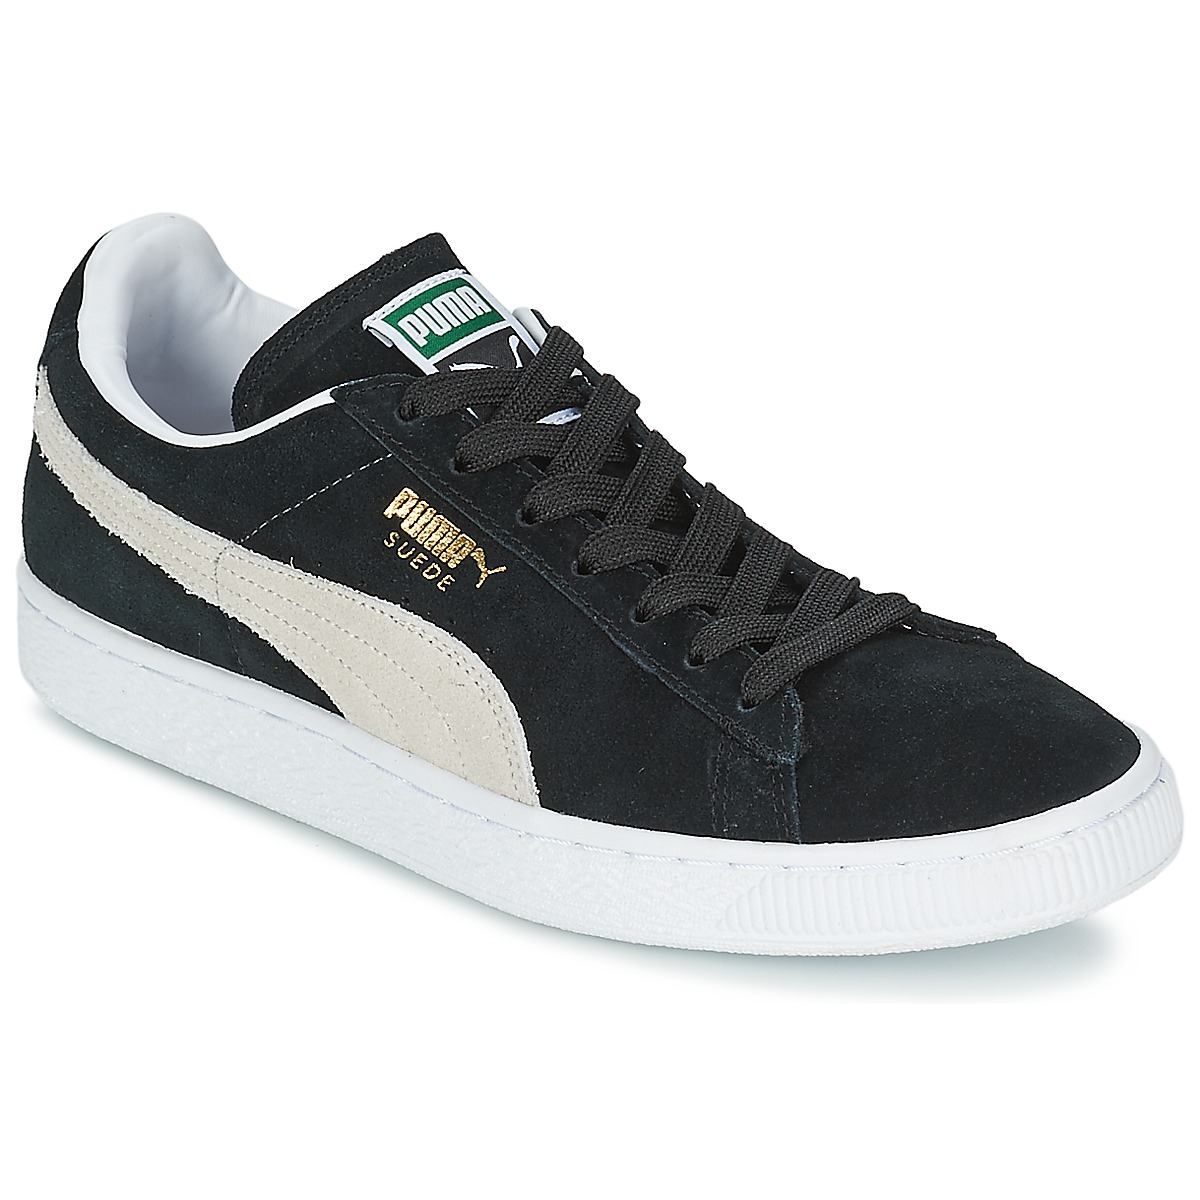 Puma SUEDE CLASSIC Black / White